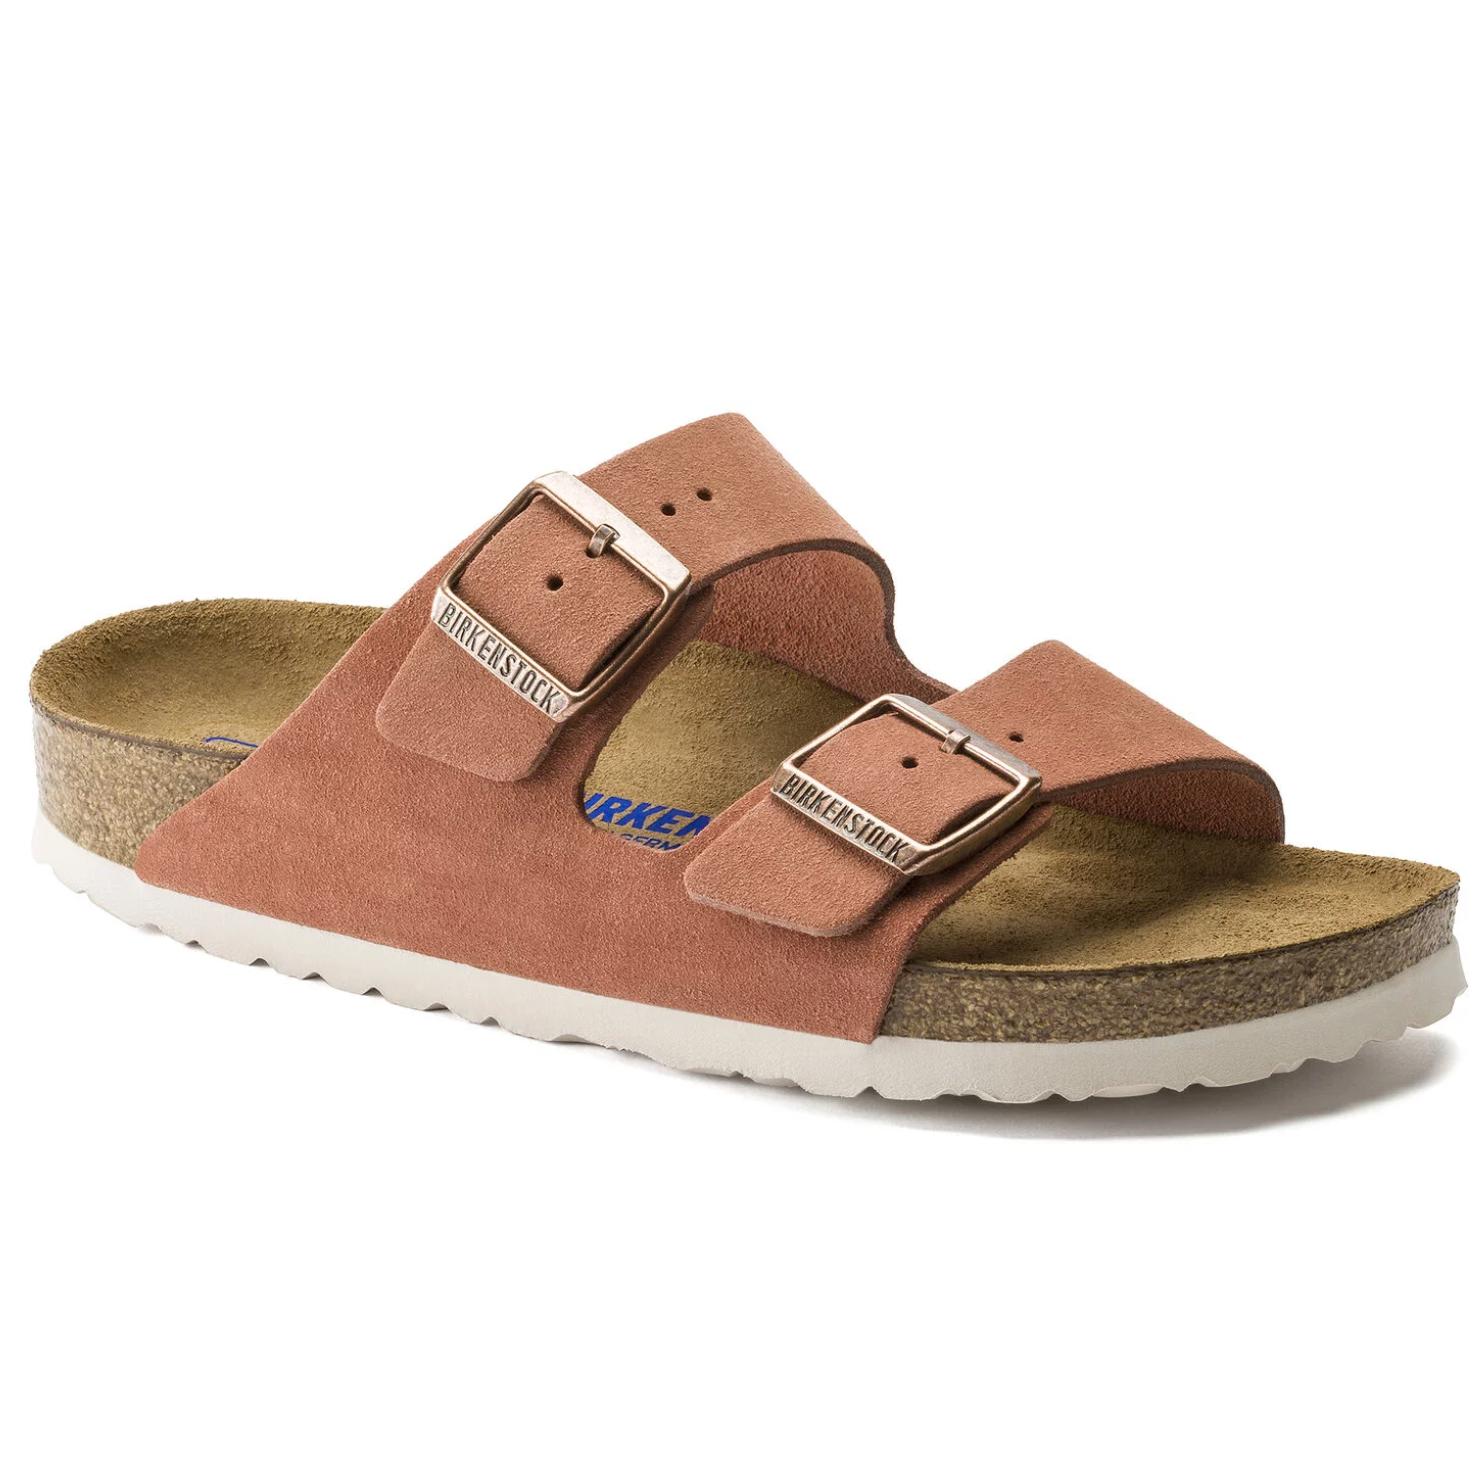 Birkenstock Arizona Soft-Footbed Sandal